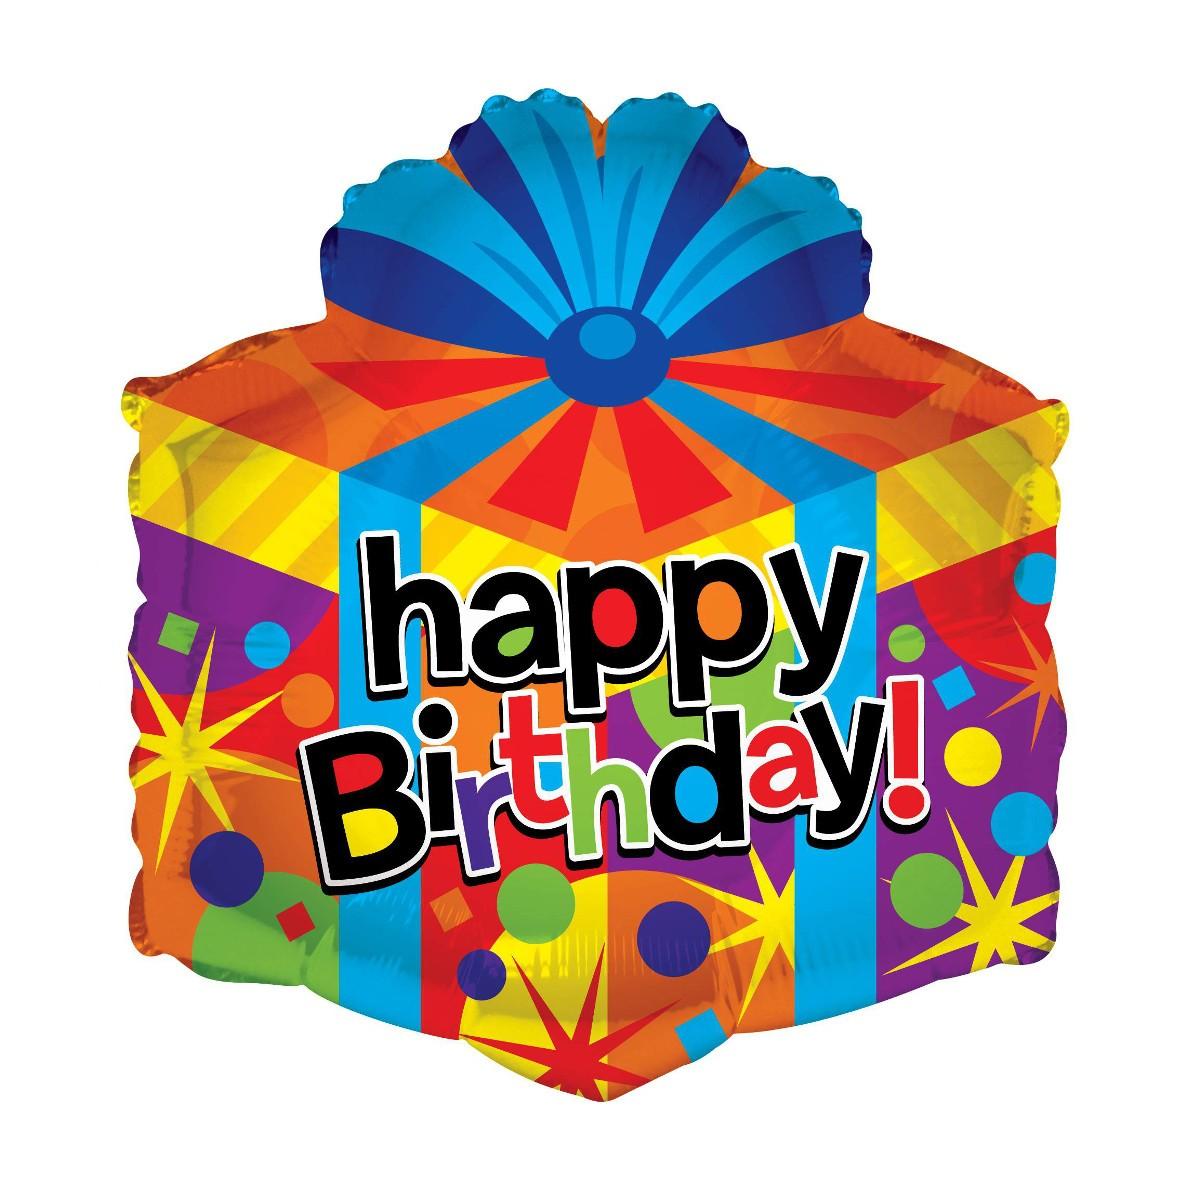 heliumballon-happy-birthday-cadeautje-cadeautjes-nl_20264-ee479efa.jpeg